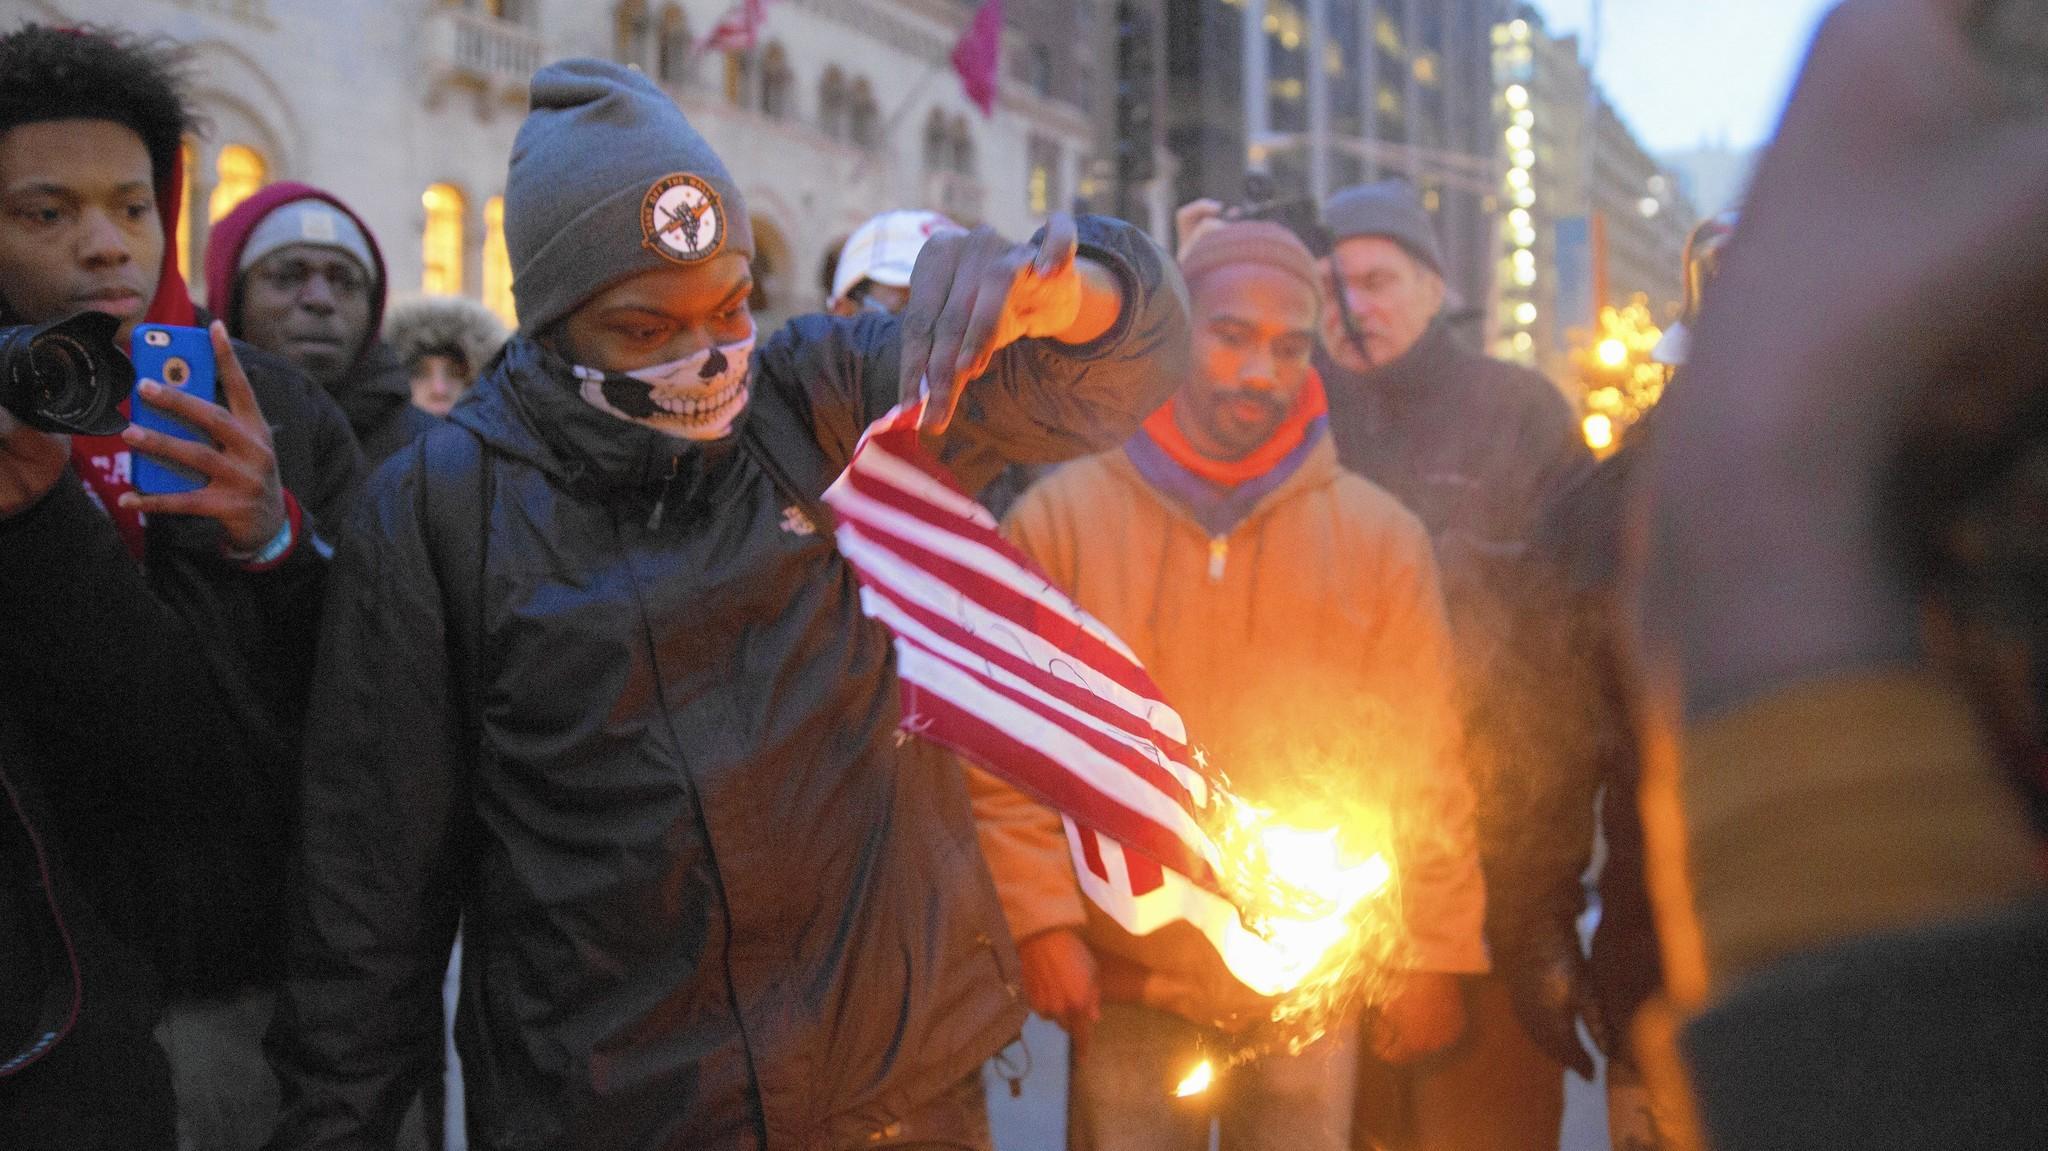 Trump Tweet Suggests Criminalizing Flag Desecration